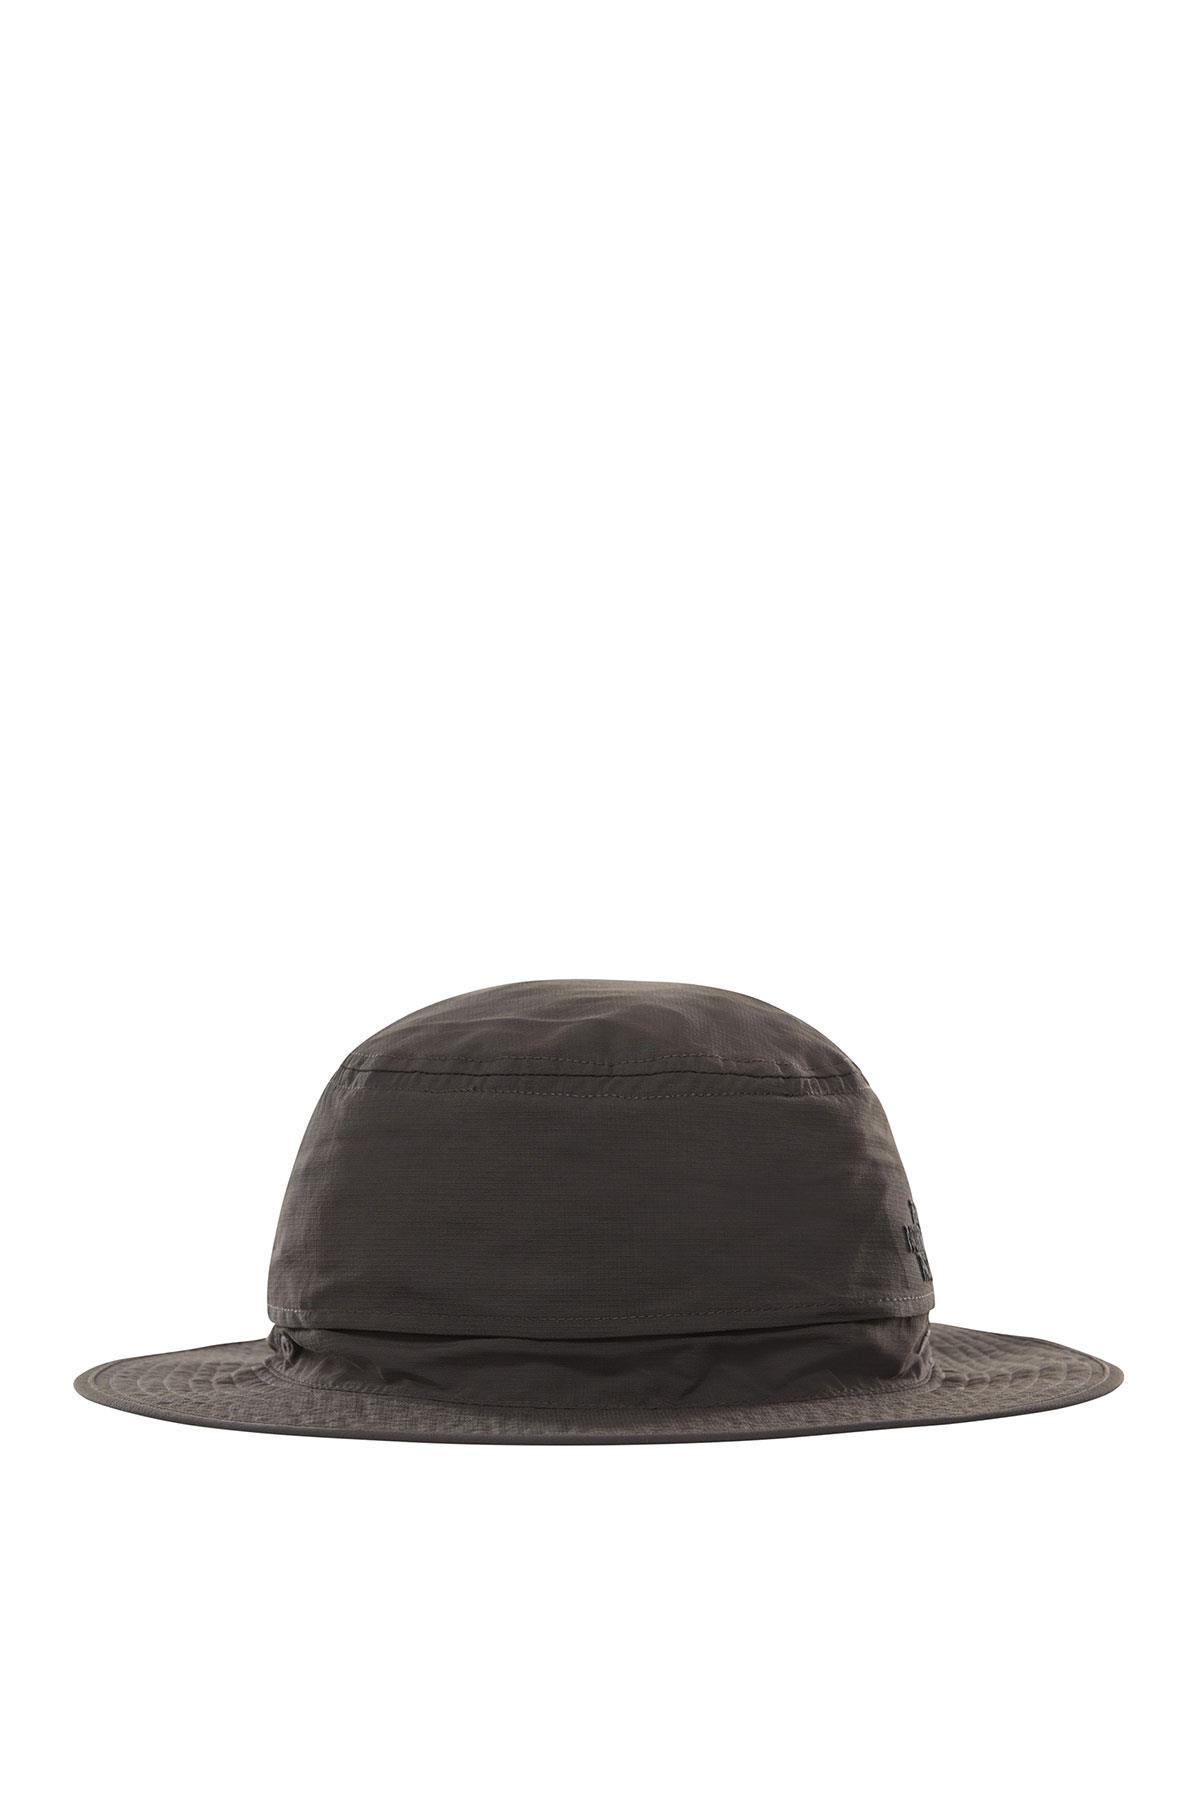 The Northface Horizon Breeze Brimmer Hat T0Cf7Tmn8